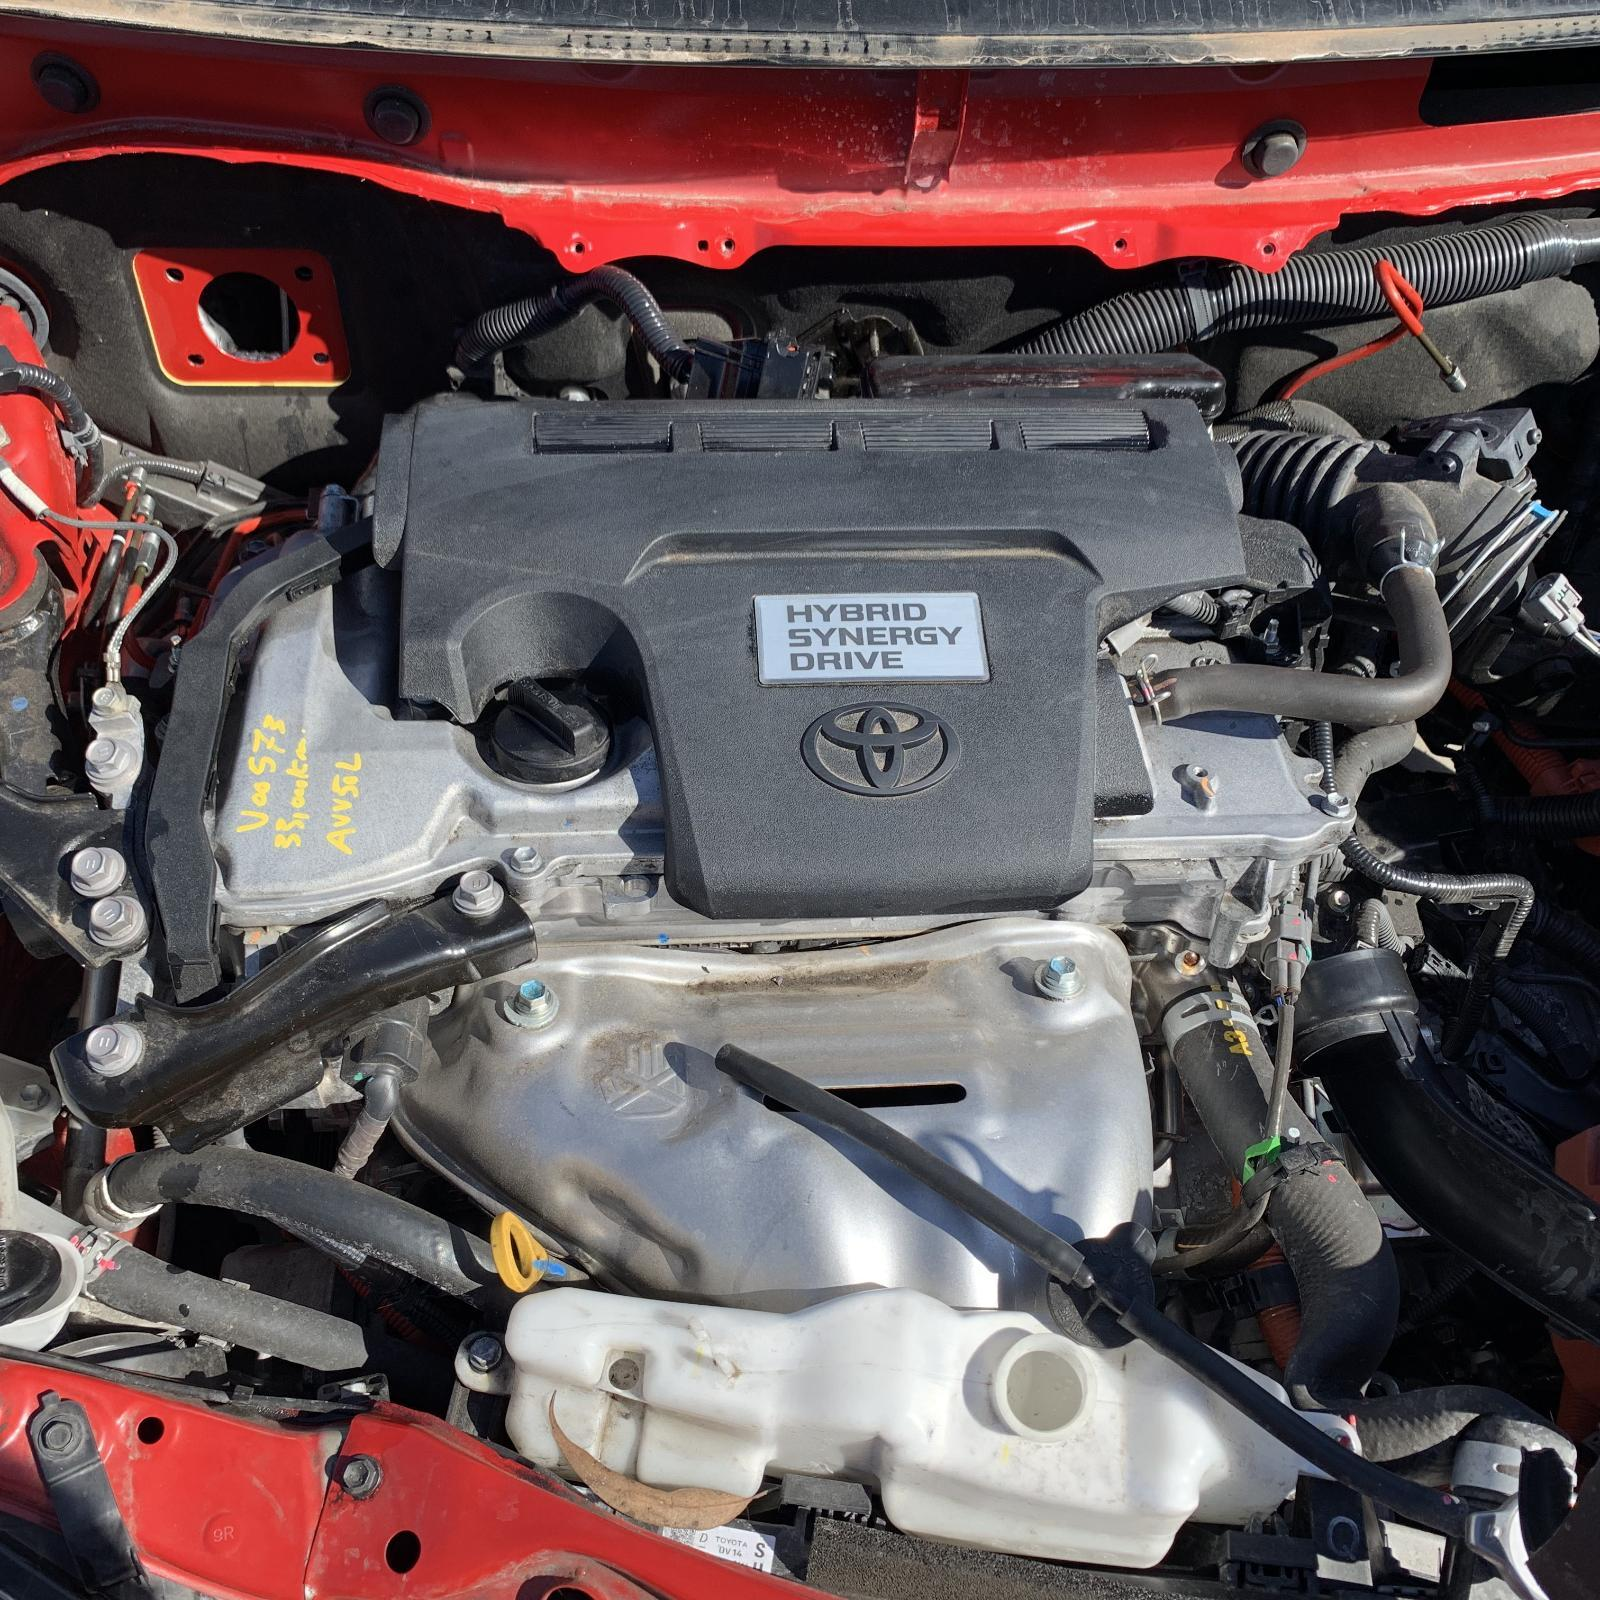 TOYOTA CAMRY, Engine, 2.5, 2AR-FXE, HYBRID, ACV50, 03/12-10/17